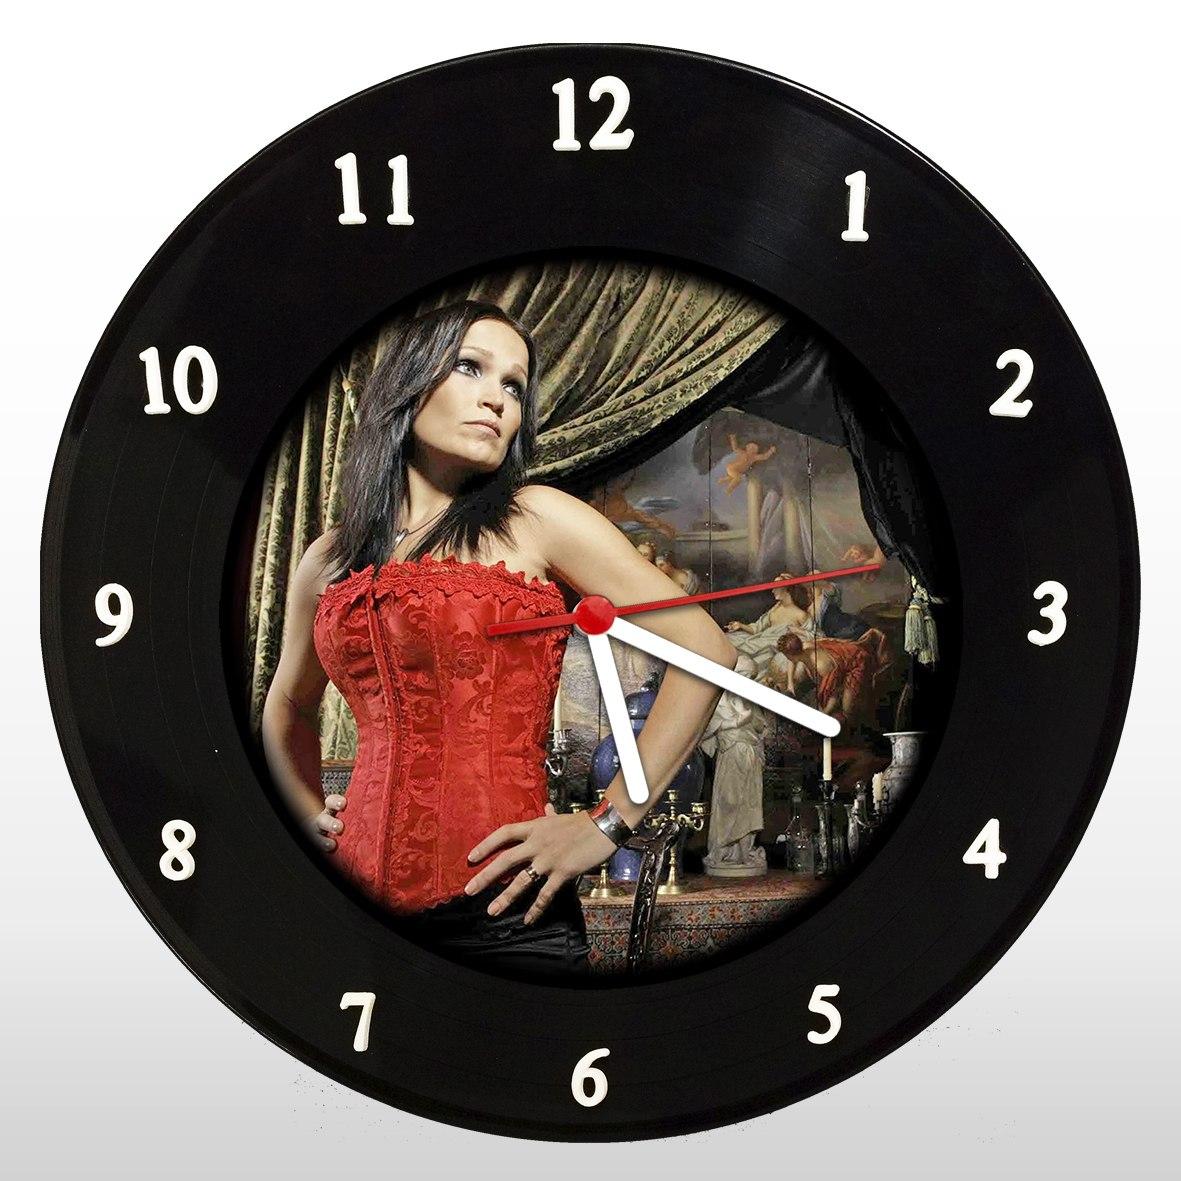 Relógio de Parede em Disco de Vinil Tarja - Mr. Rock